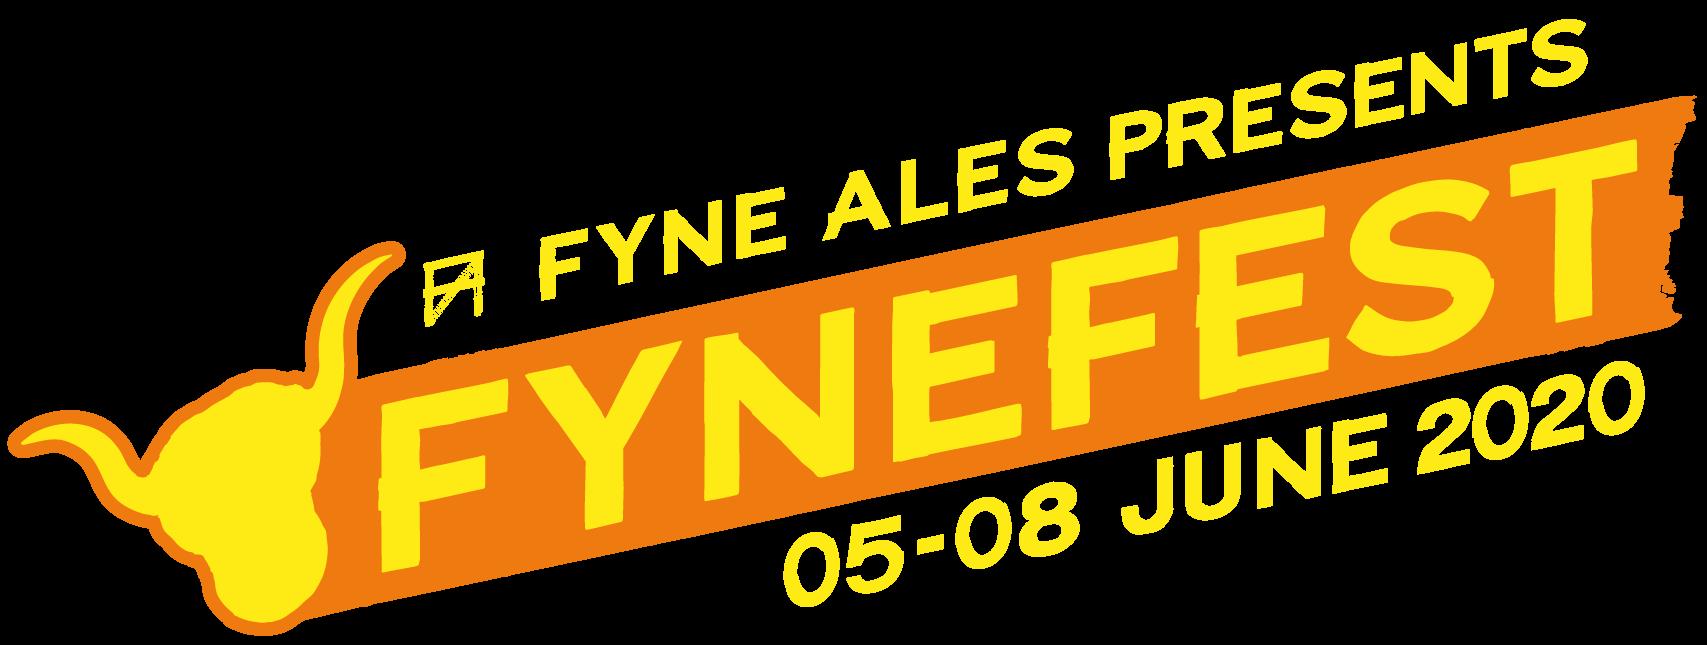 FyneFest 2021